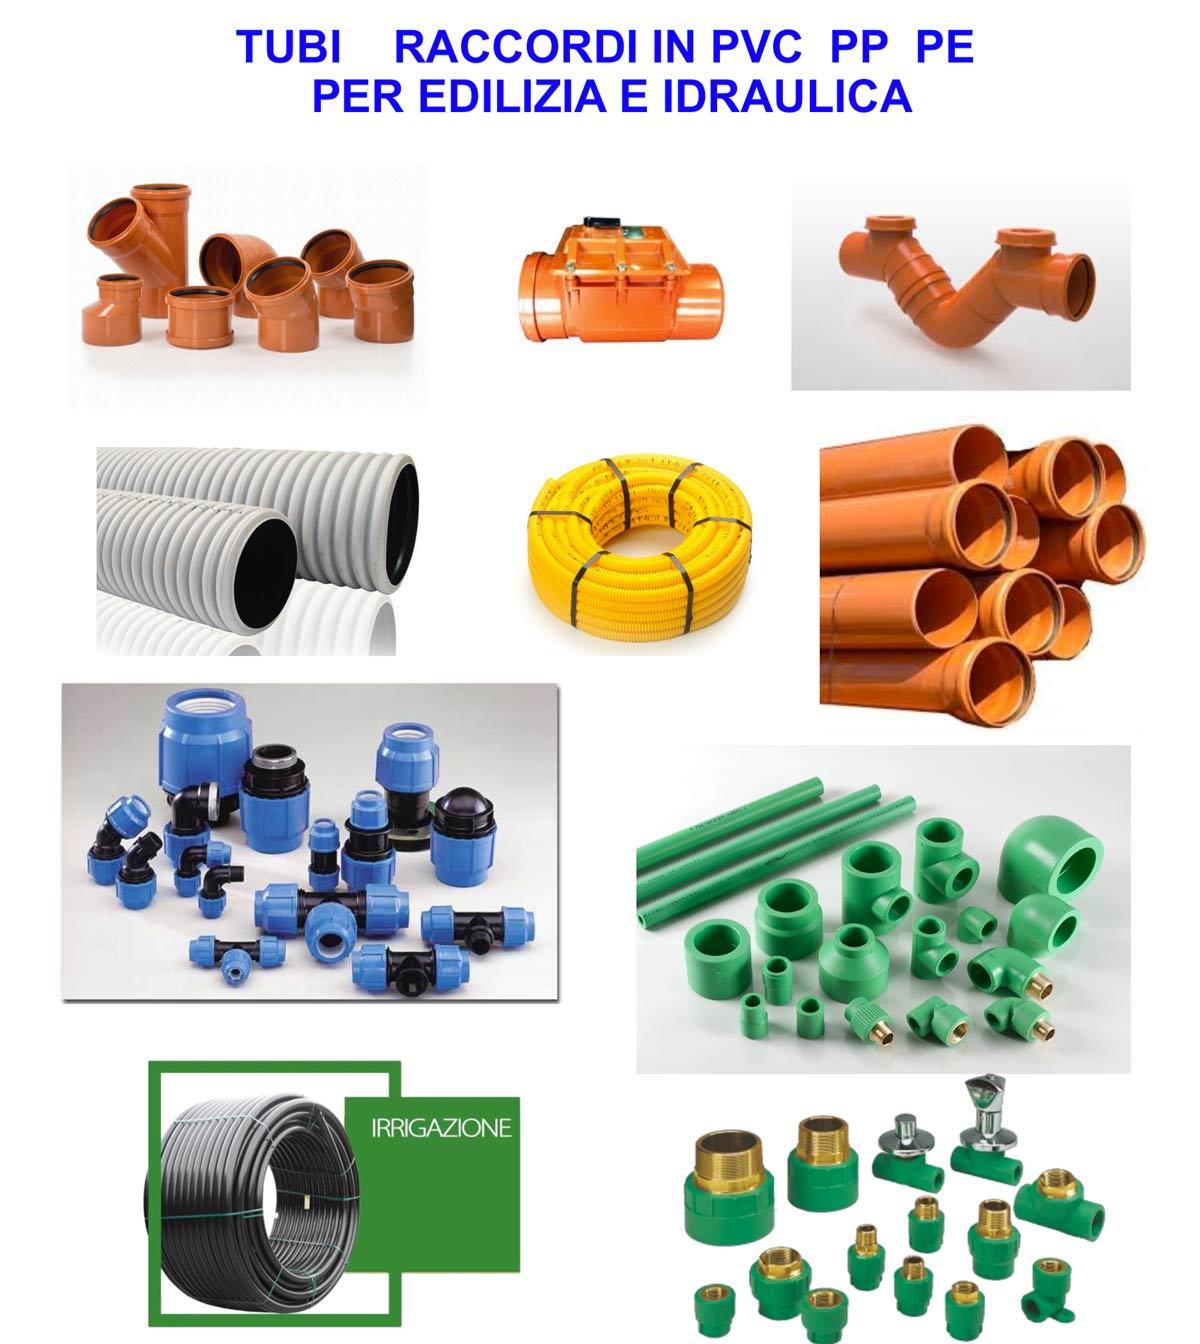 Pesaresi | Tubi valvole e raccordi per edilizia e idraulica